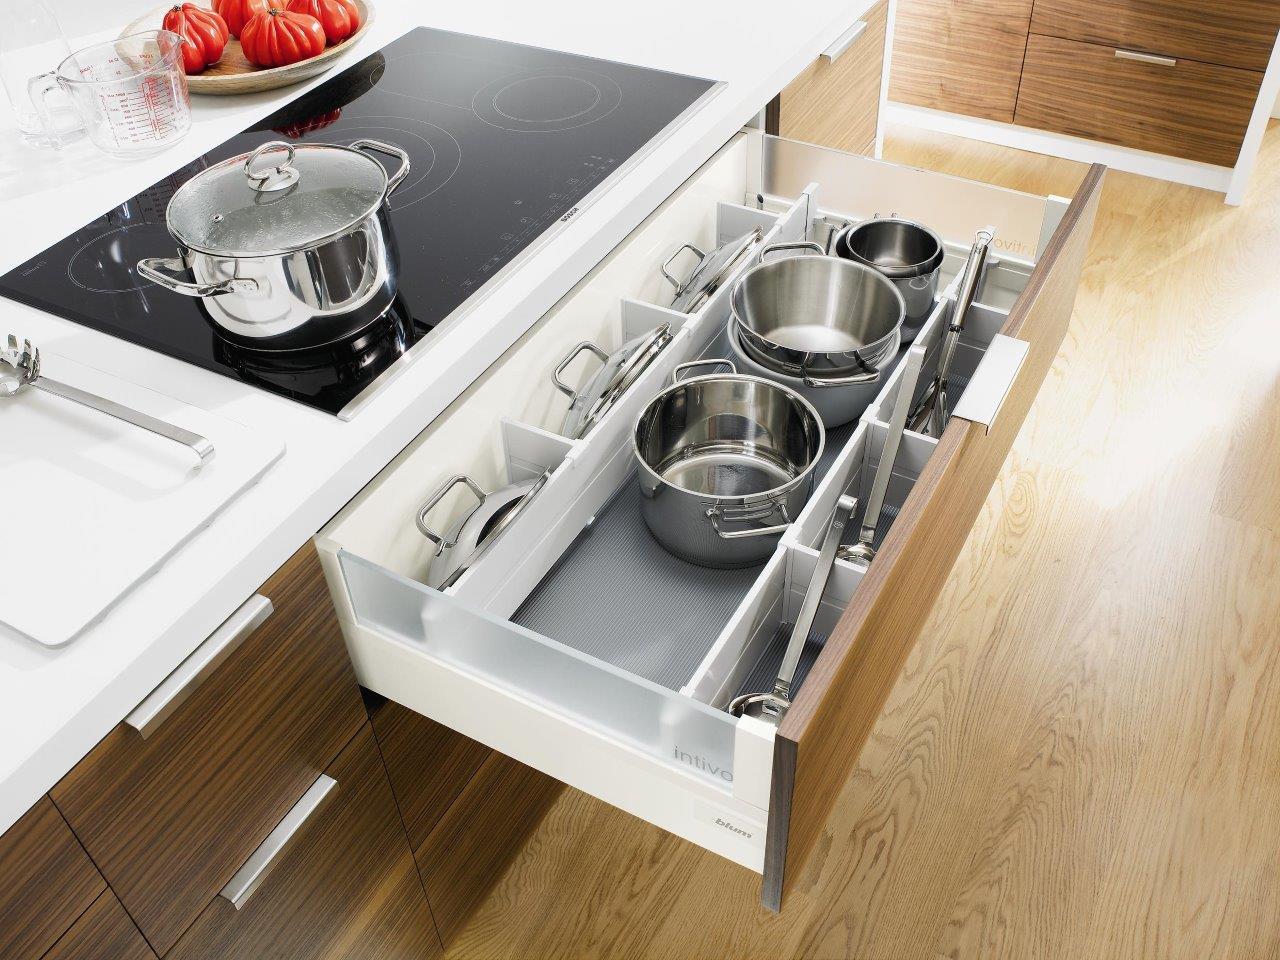 szuflada na garnki funkcjonalna kuchnia projektowanie kuchni kuchnia design projekty. Black Bedroom Furniture Sets. Home Design Ideas